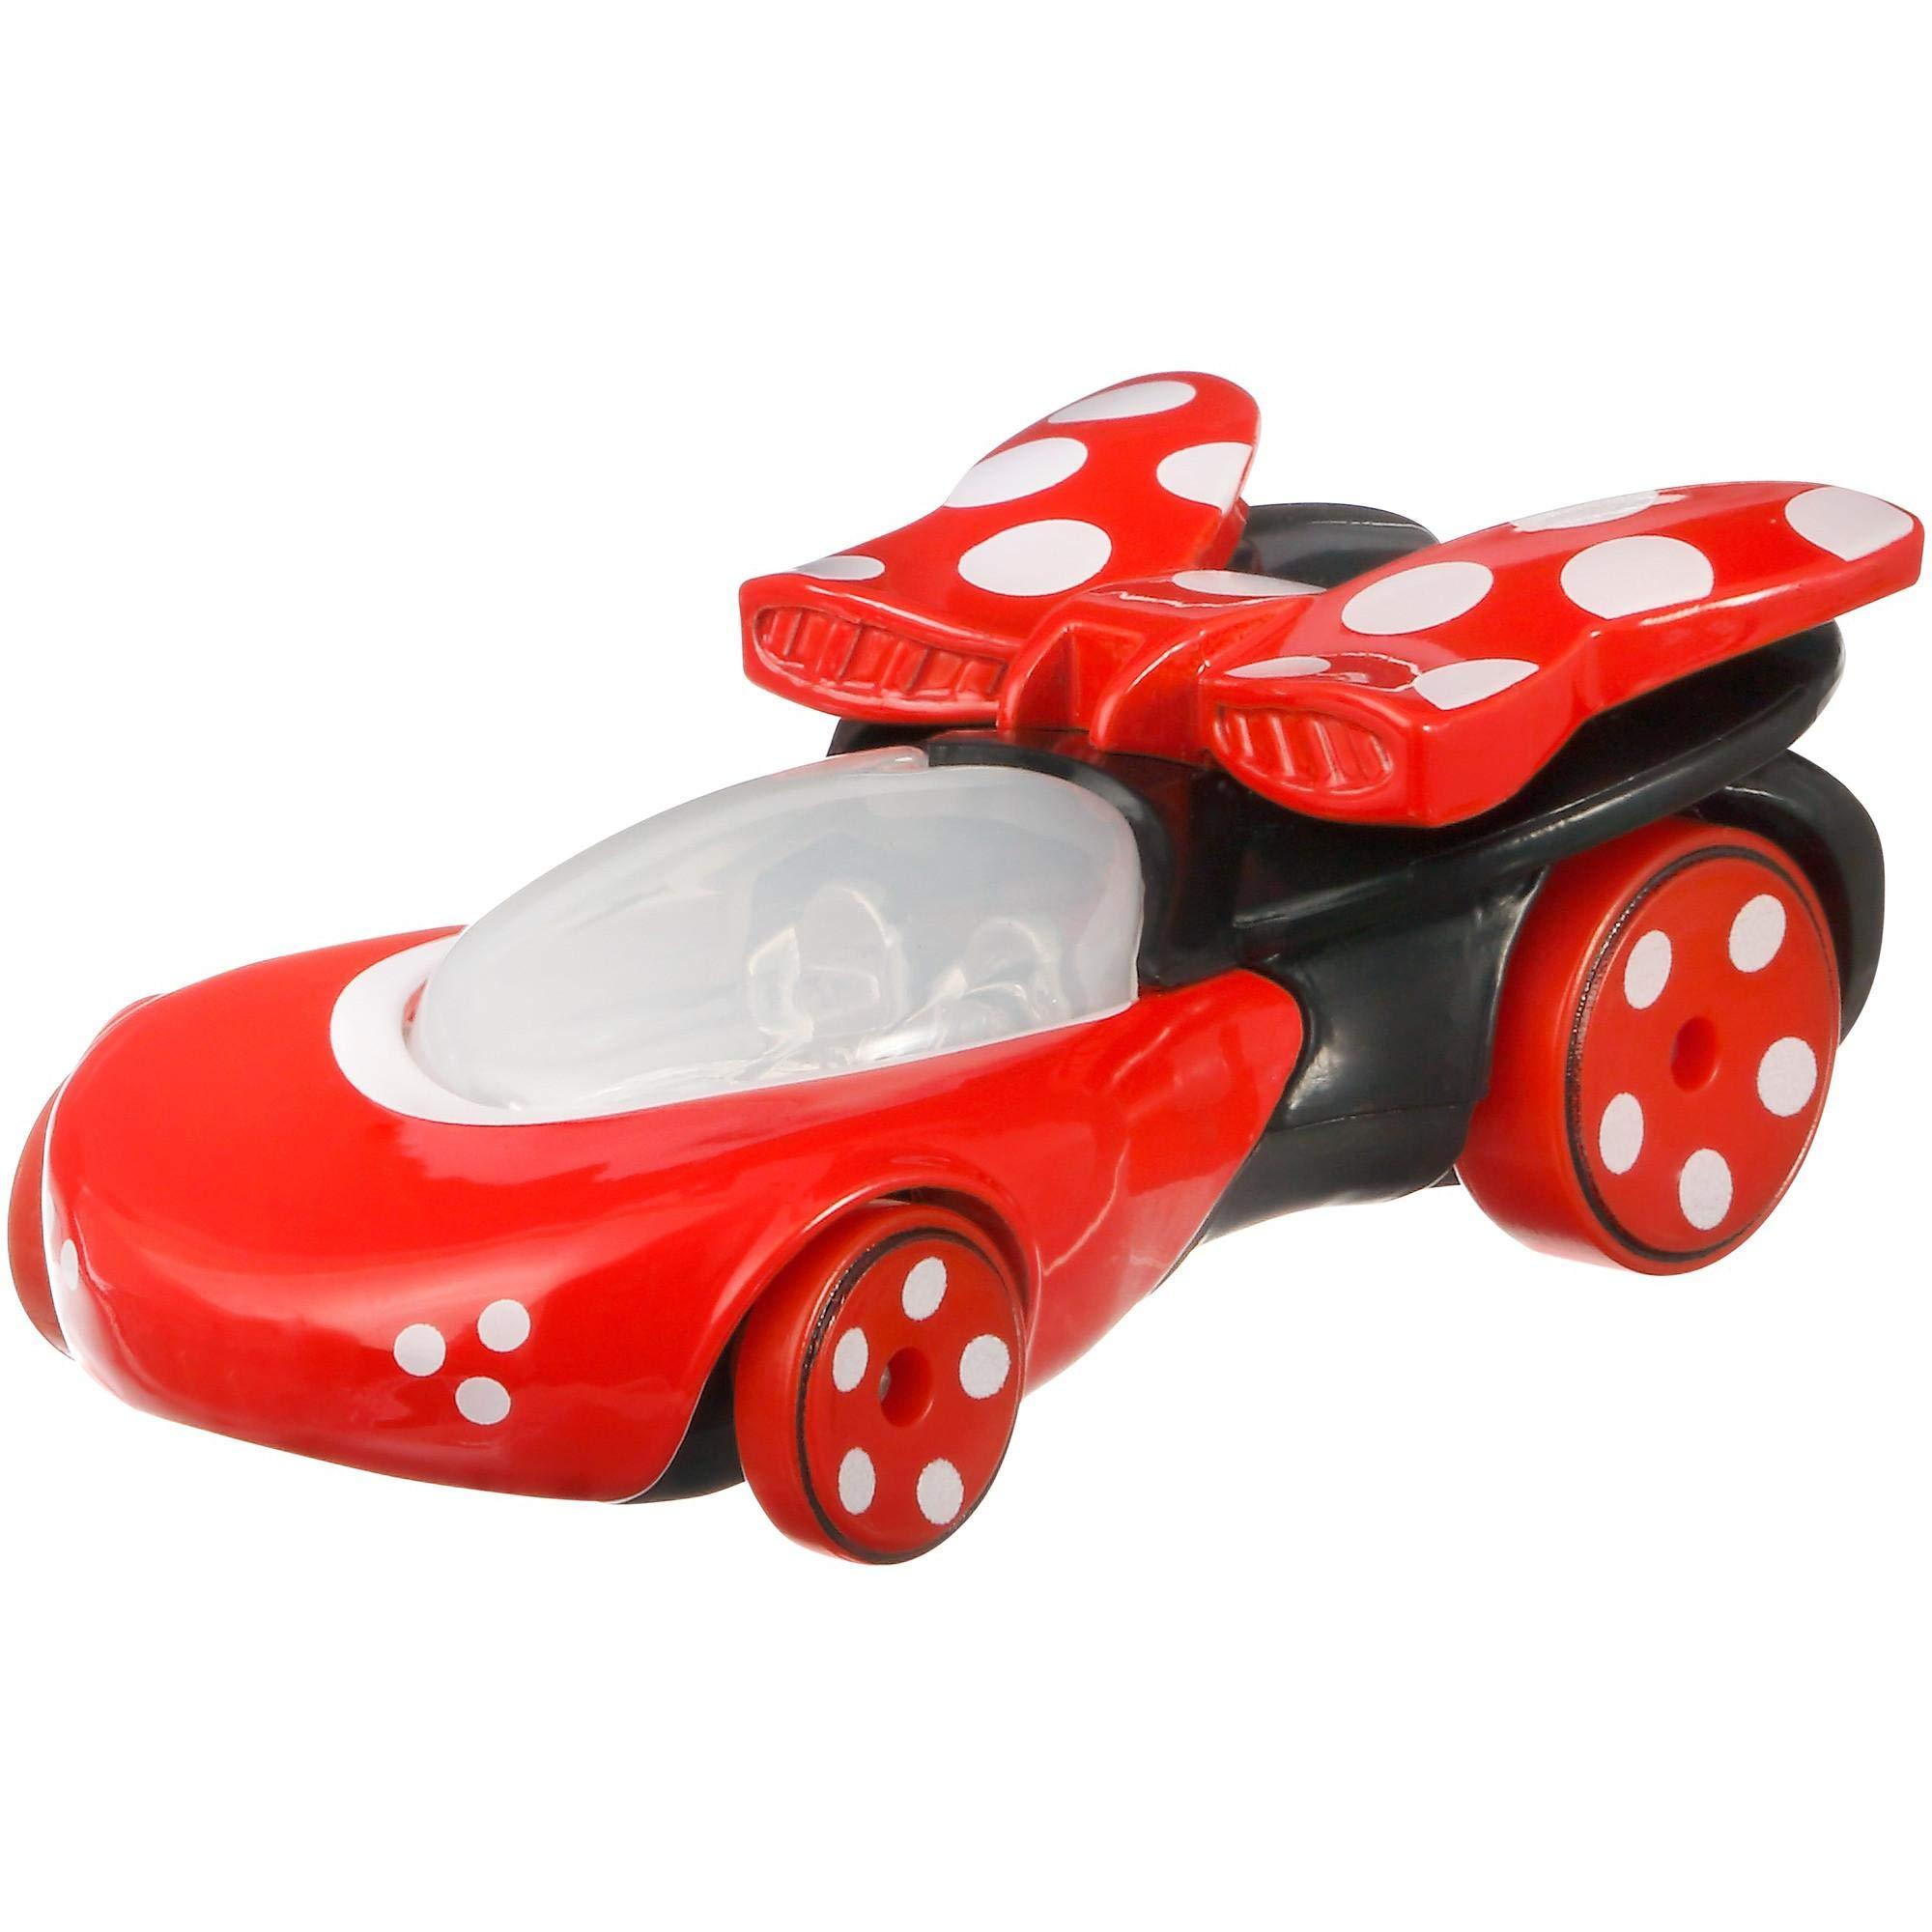 Daisy duck mickey donald duck vandetta chip dale horseplay minnie mouse quick sik goofy fandango /& pluto 16 angels vehicles 1:64 scale diecast model Hotwheels Disney 8 piece set